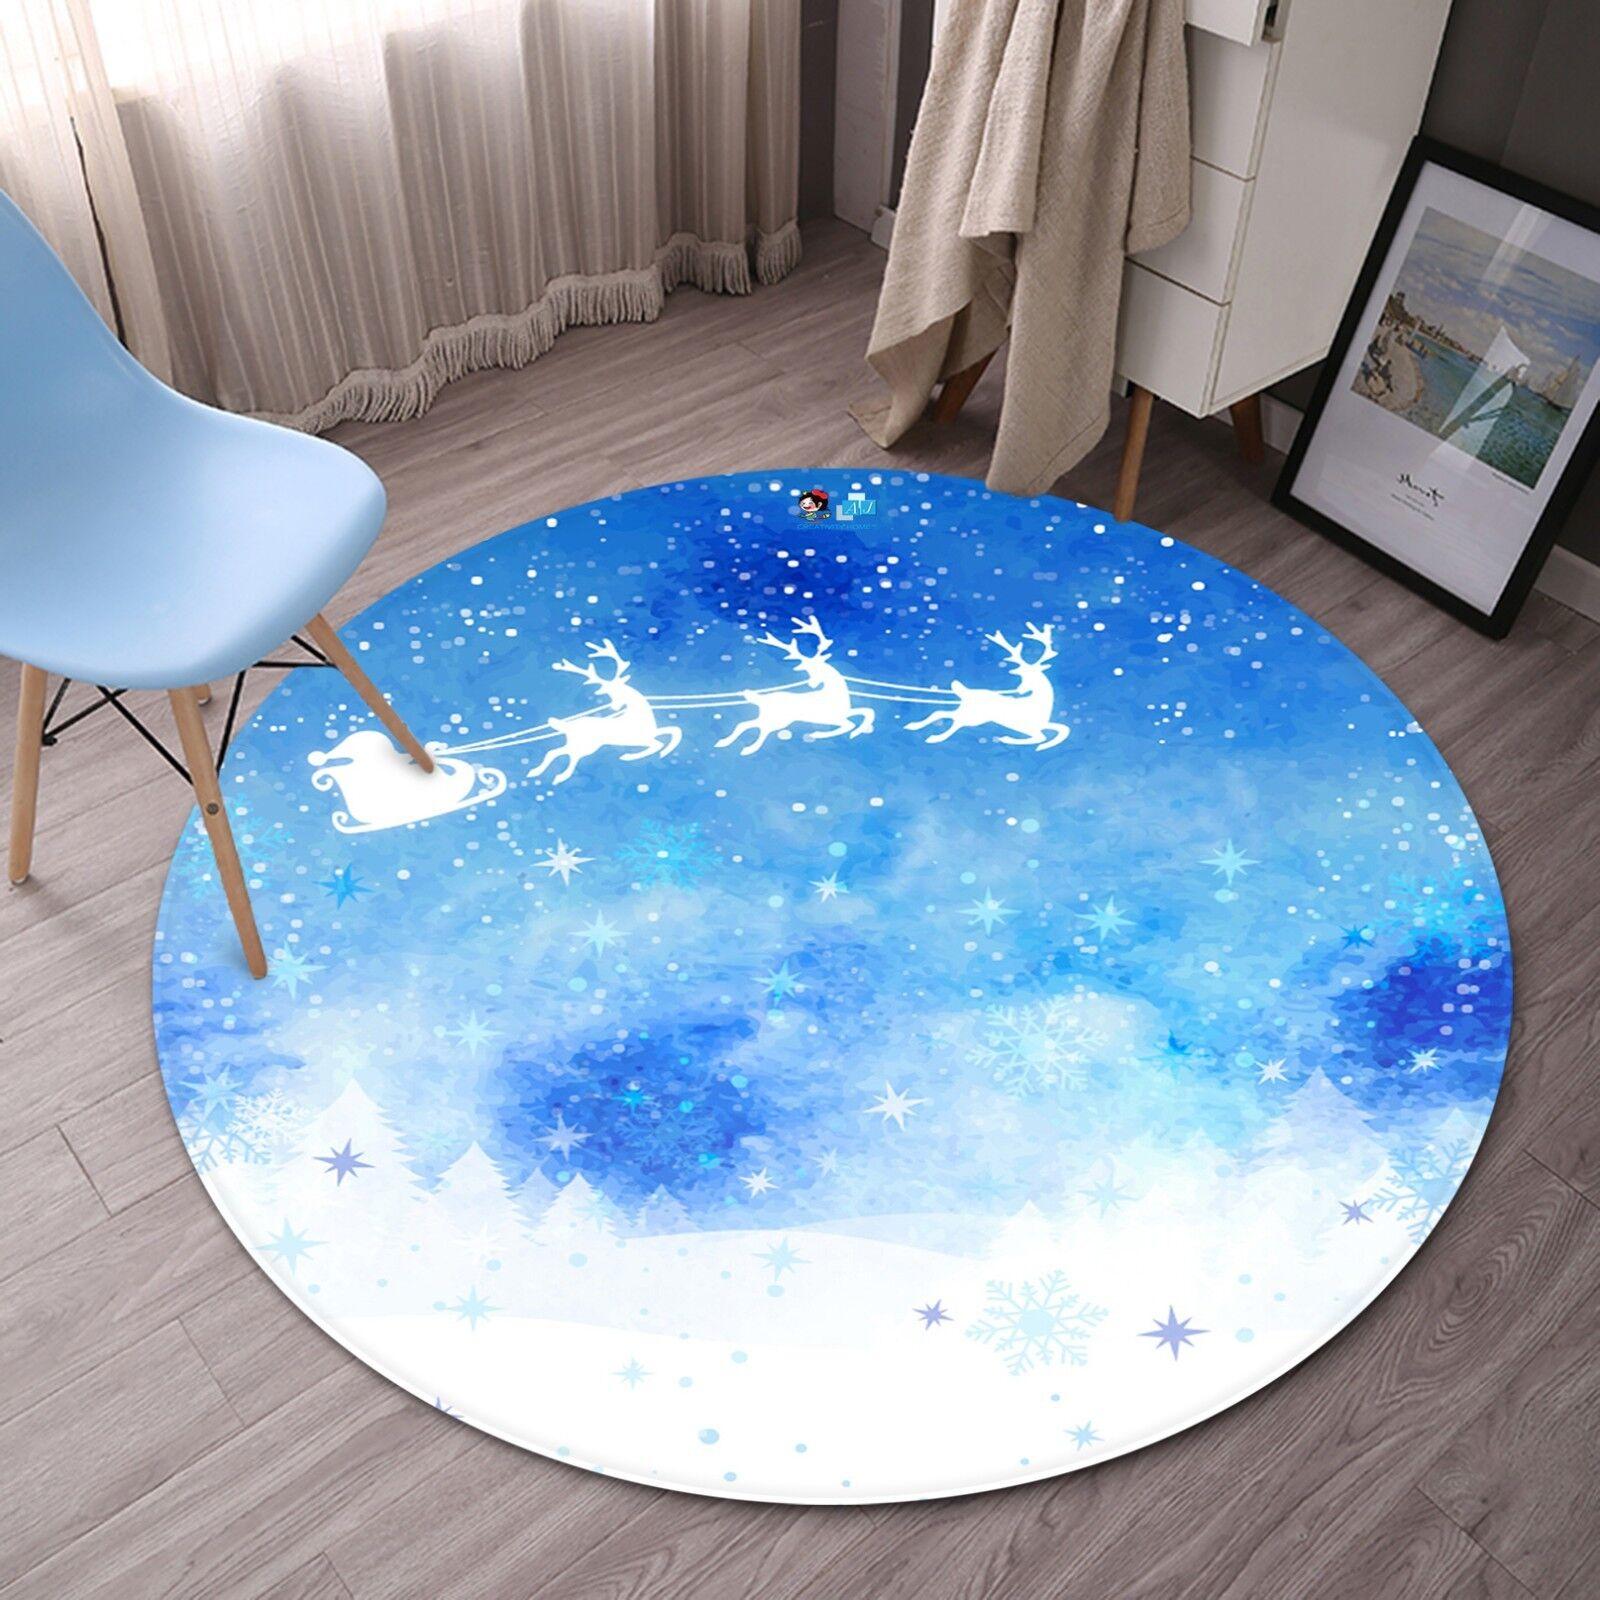 3D Weihnachten Xmas 651 651 651 Rutschfest Teppich Matte Raum Runden Elegant Teppich DE 6f549e